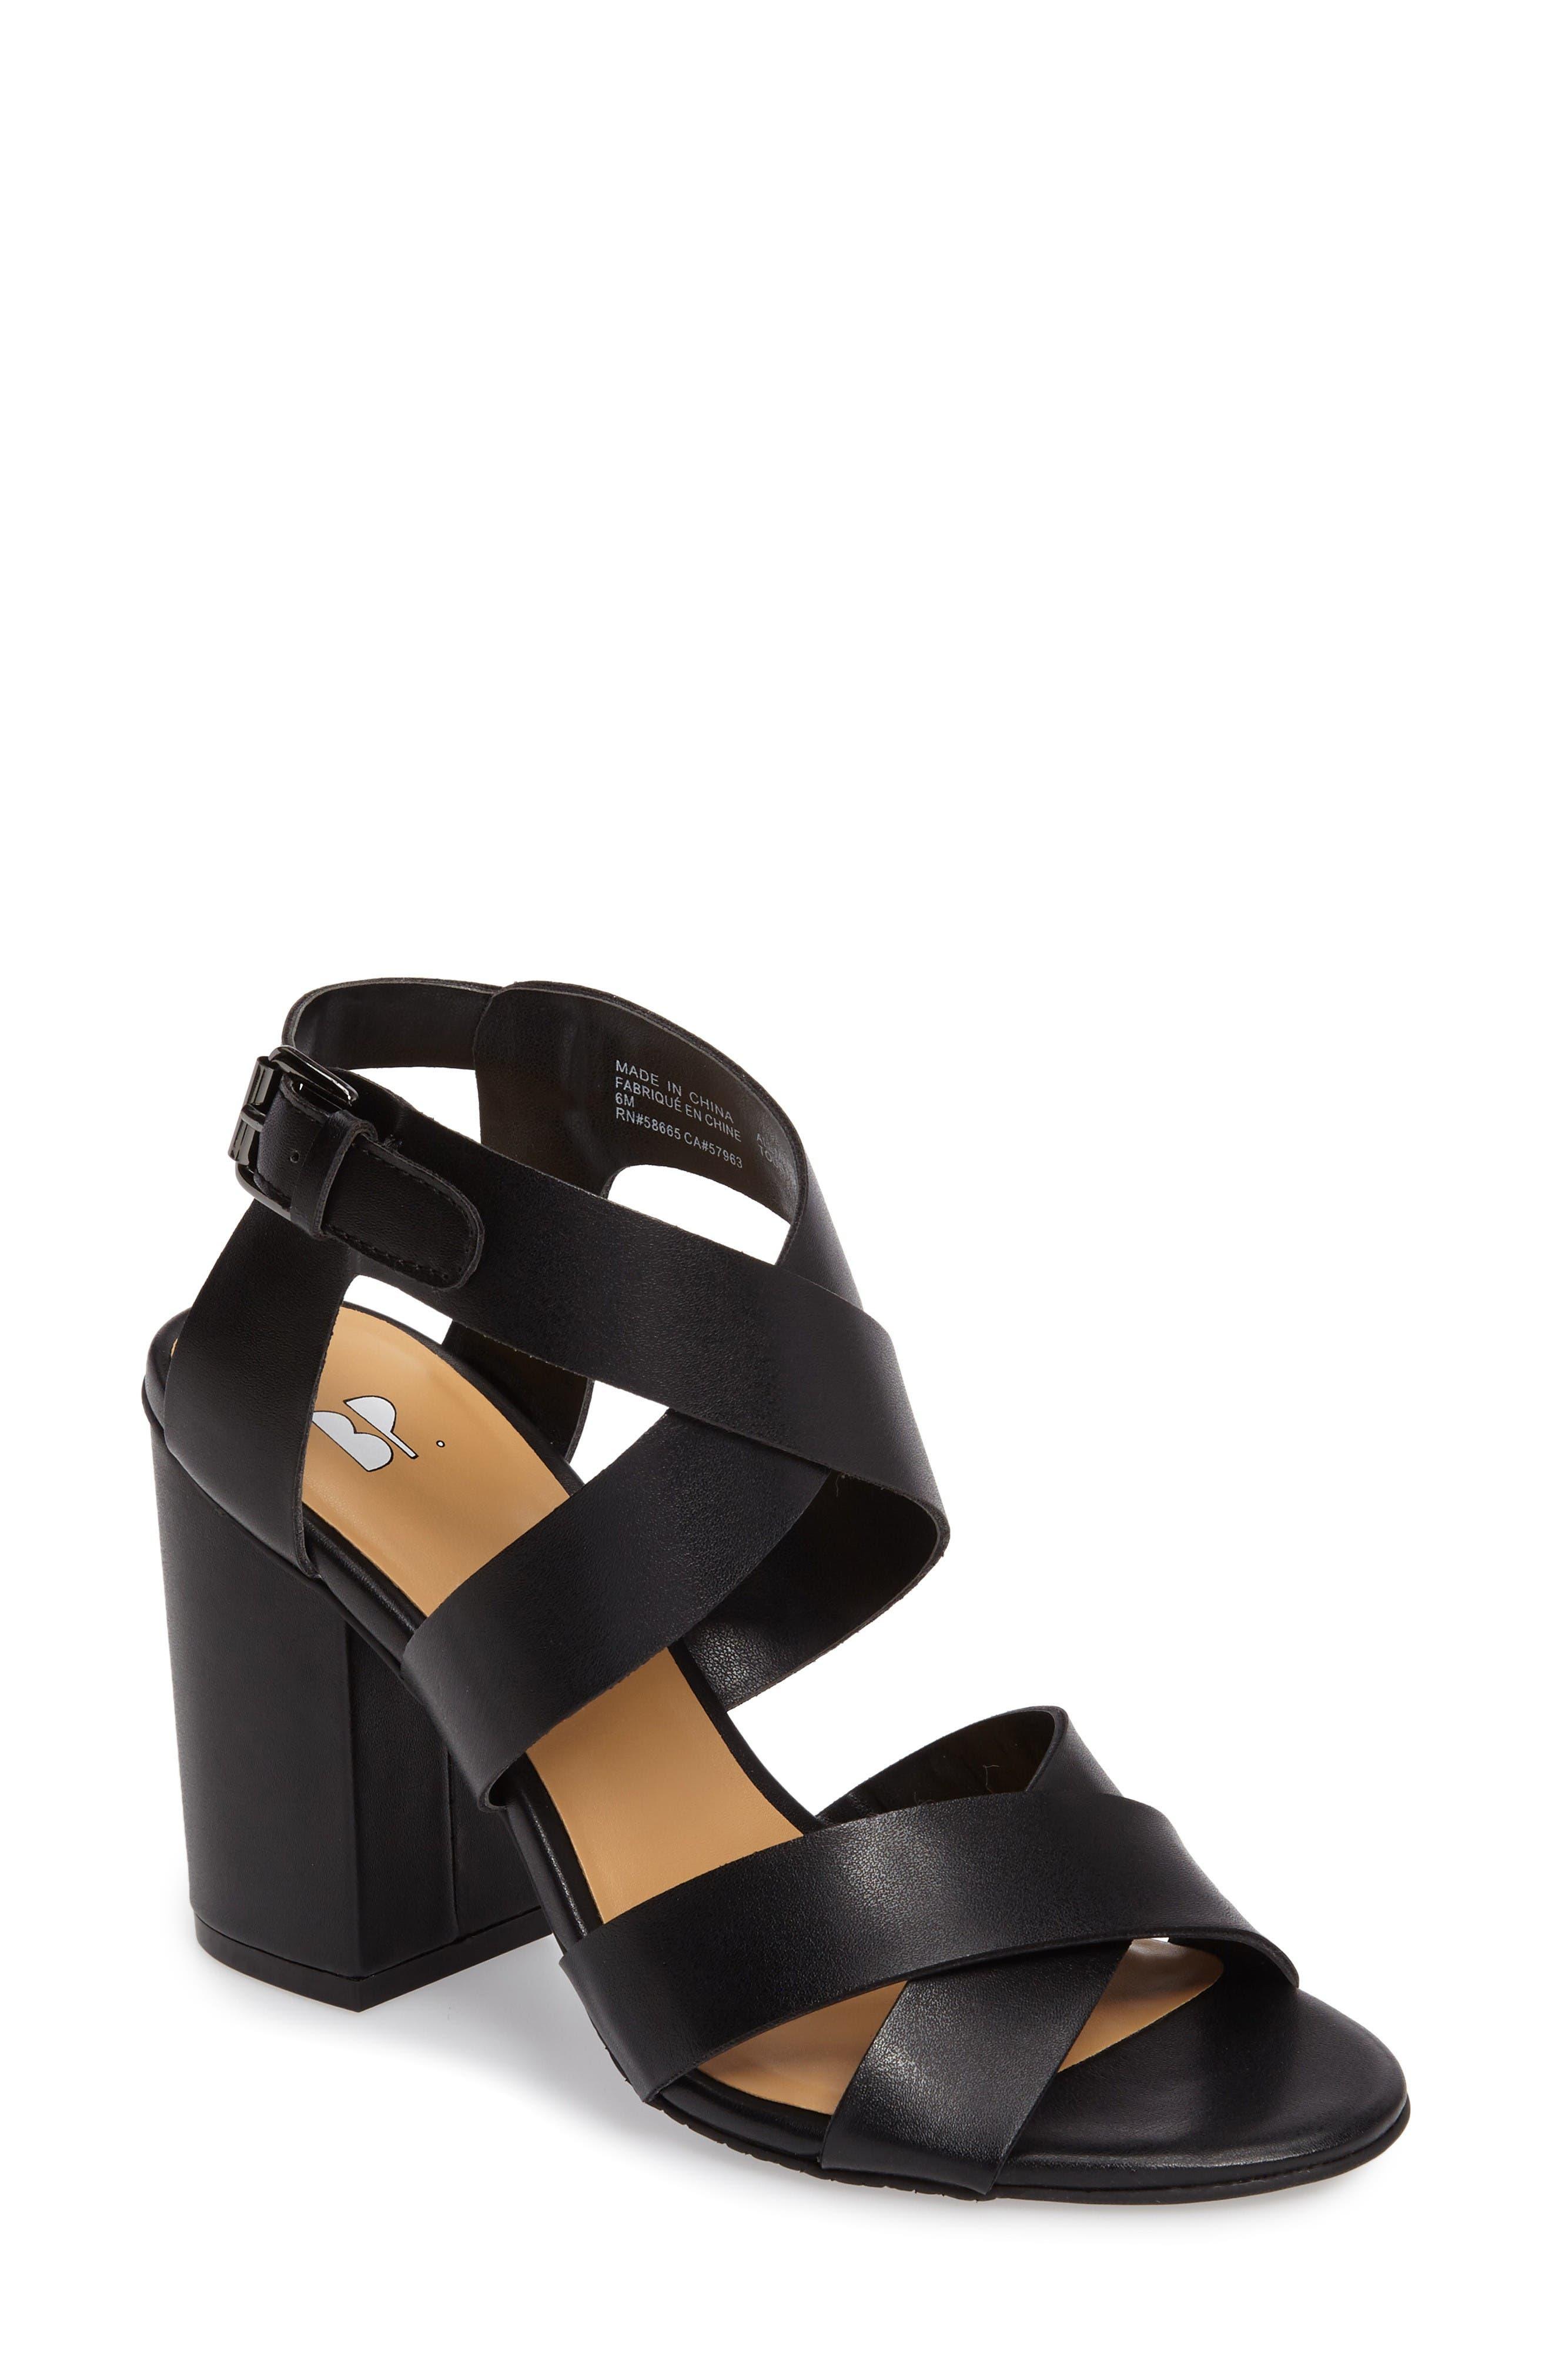 Terry Block Heel Sandal,                             Main thumbnail 1, color,                             Black Faux Leather